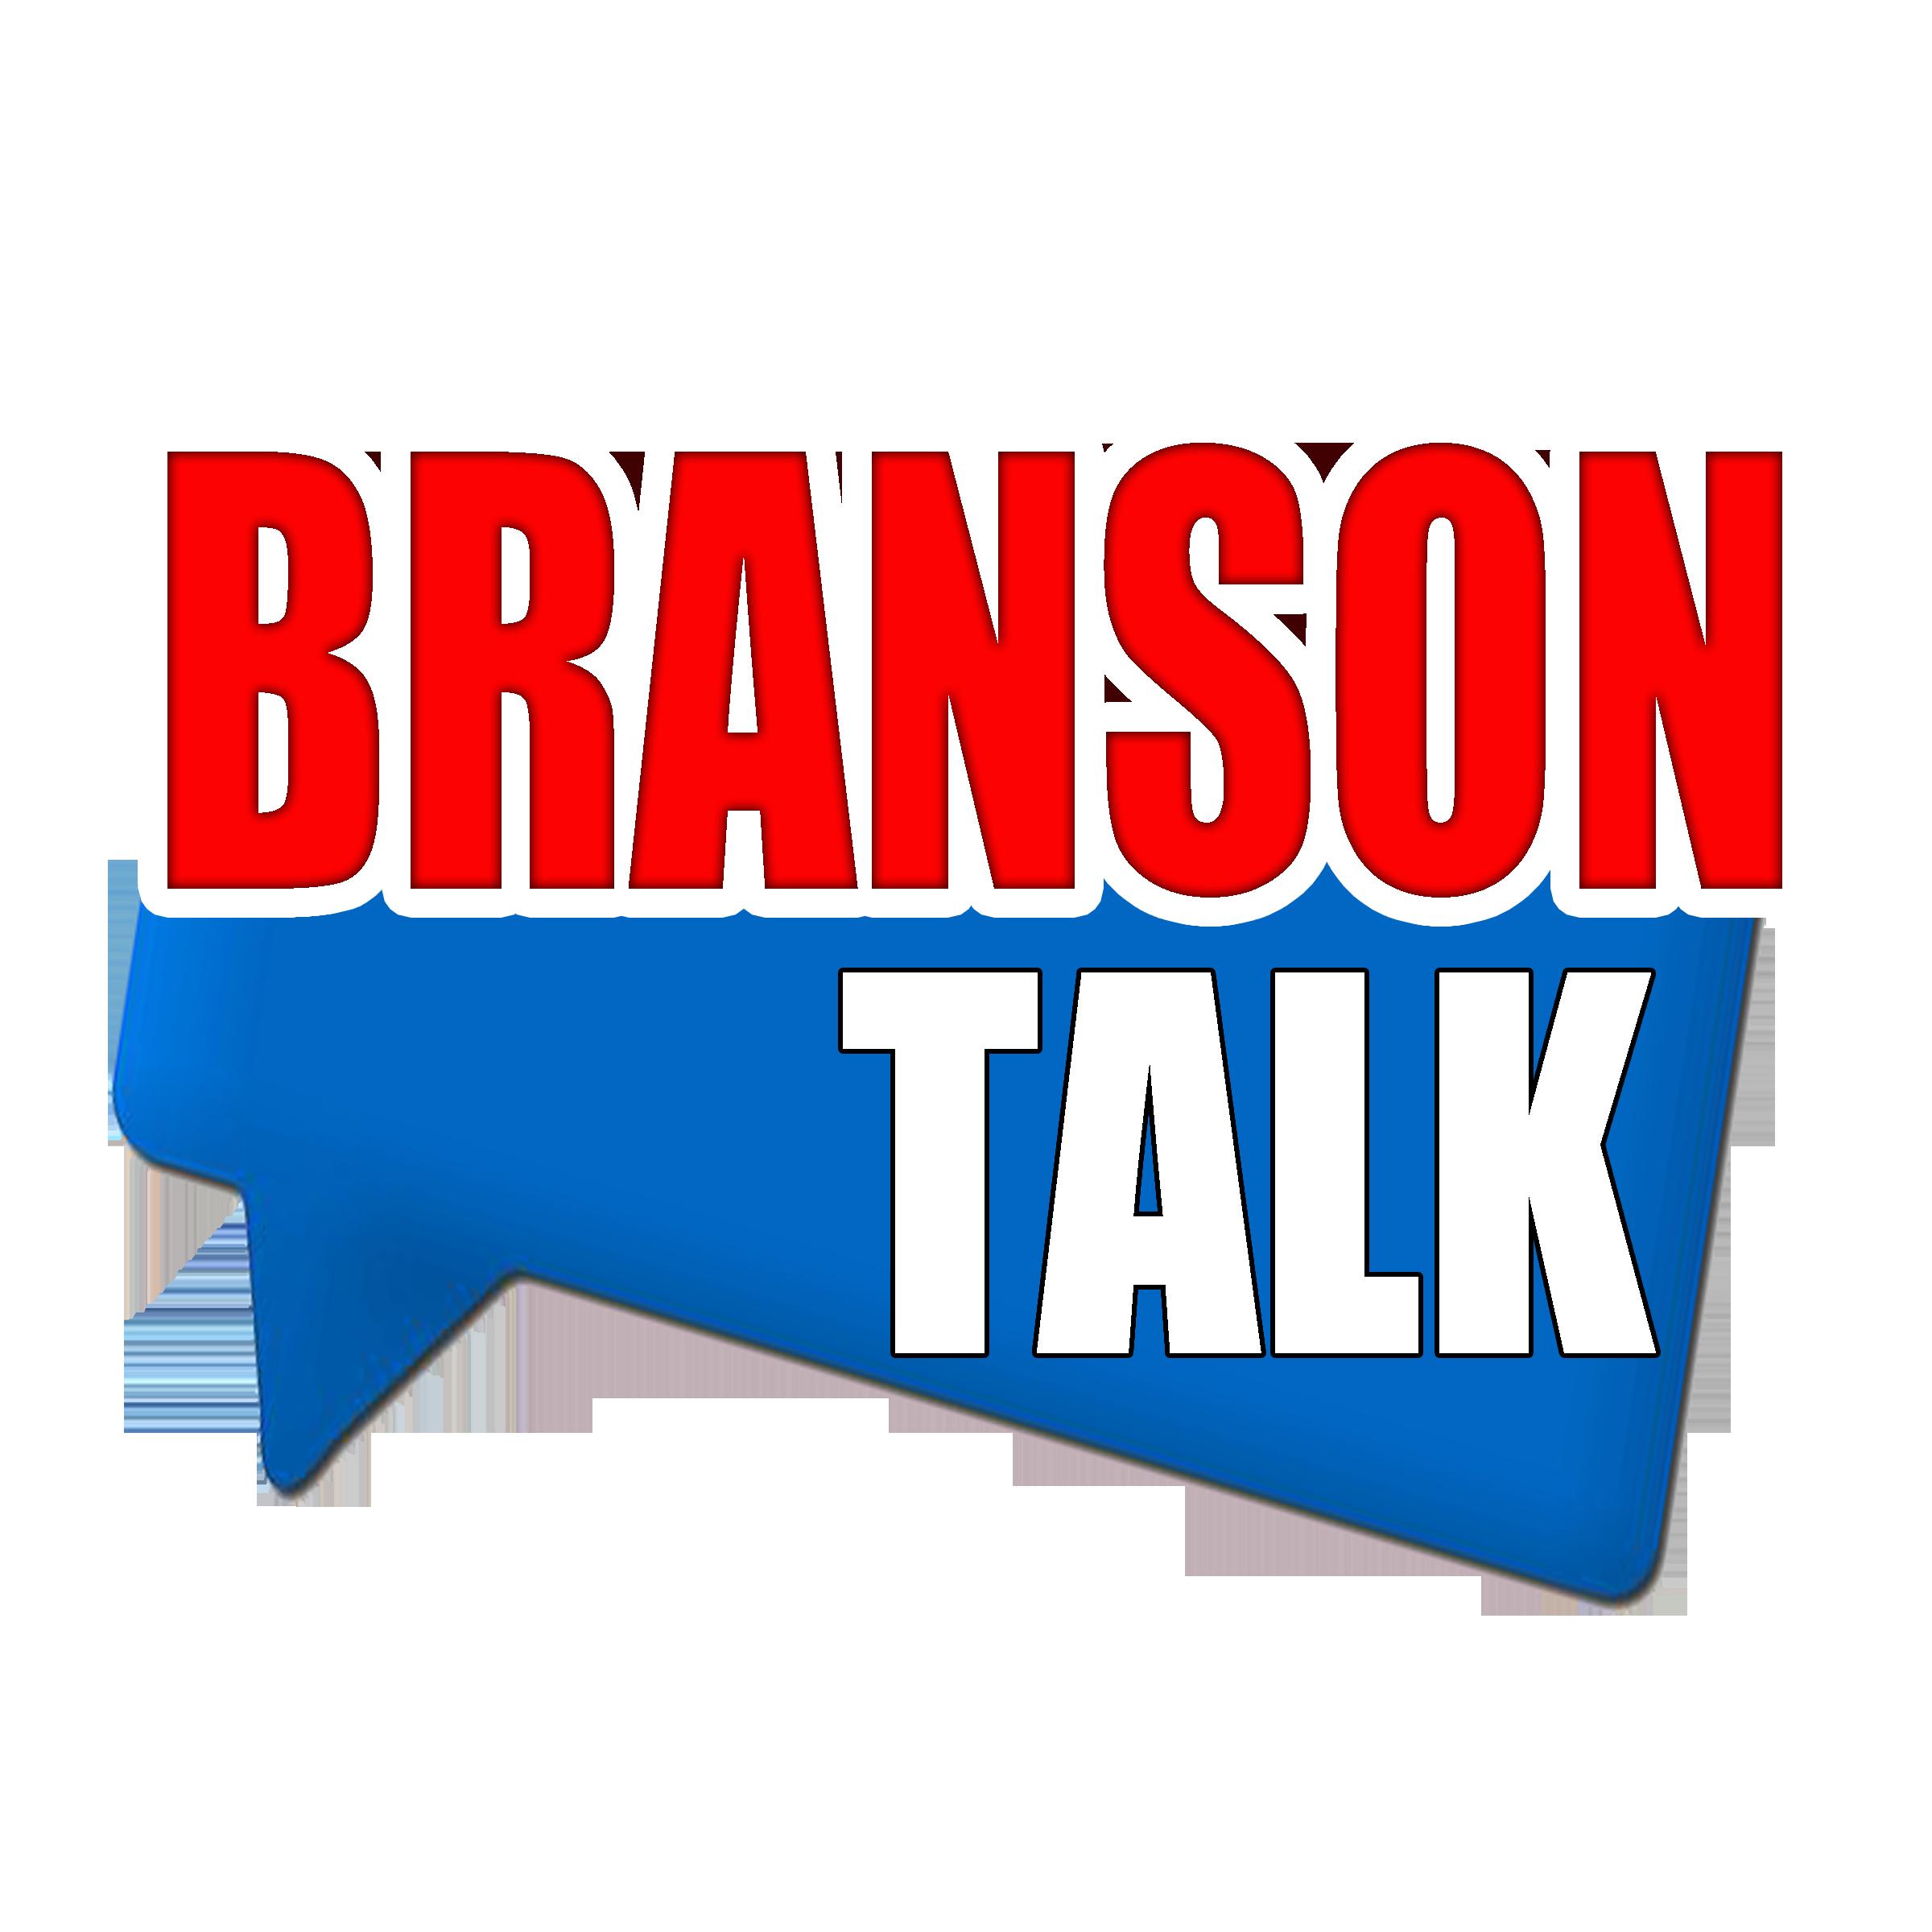 Branson Talk show art